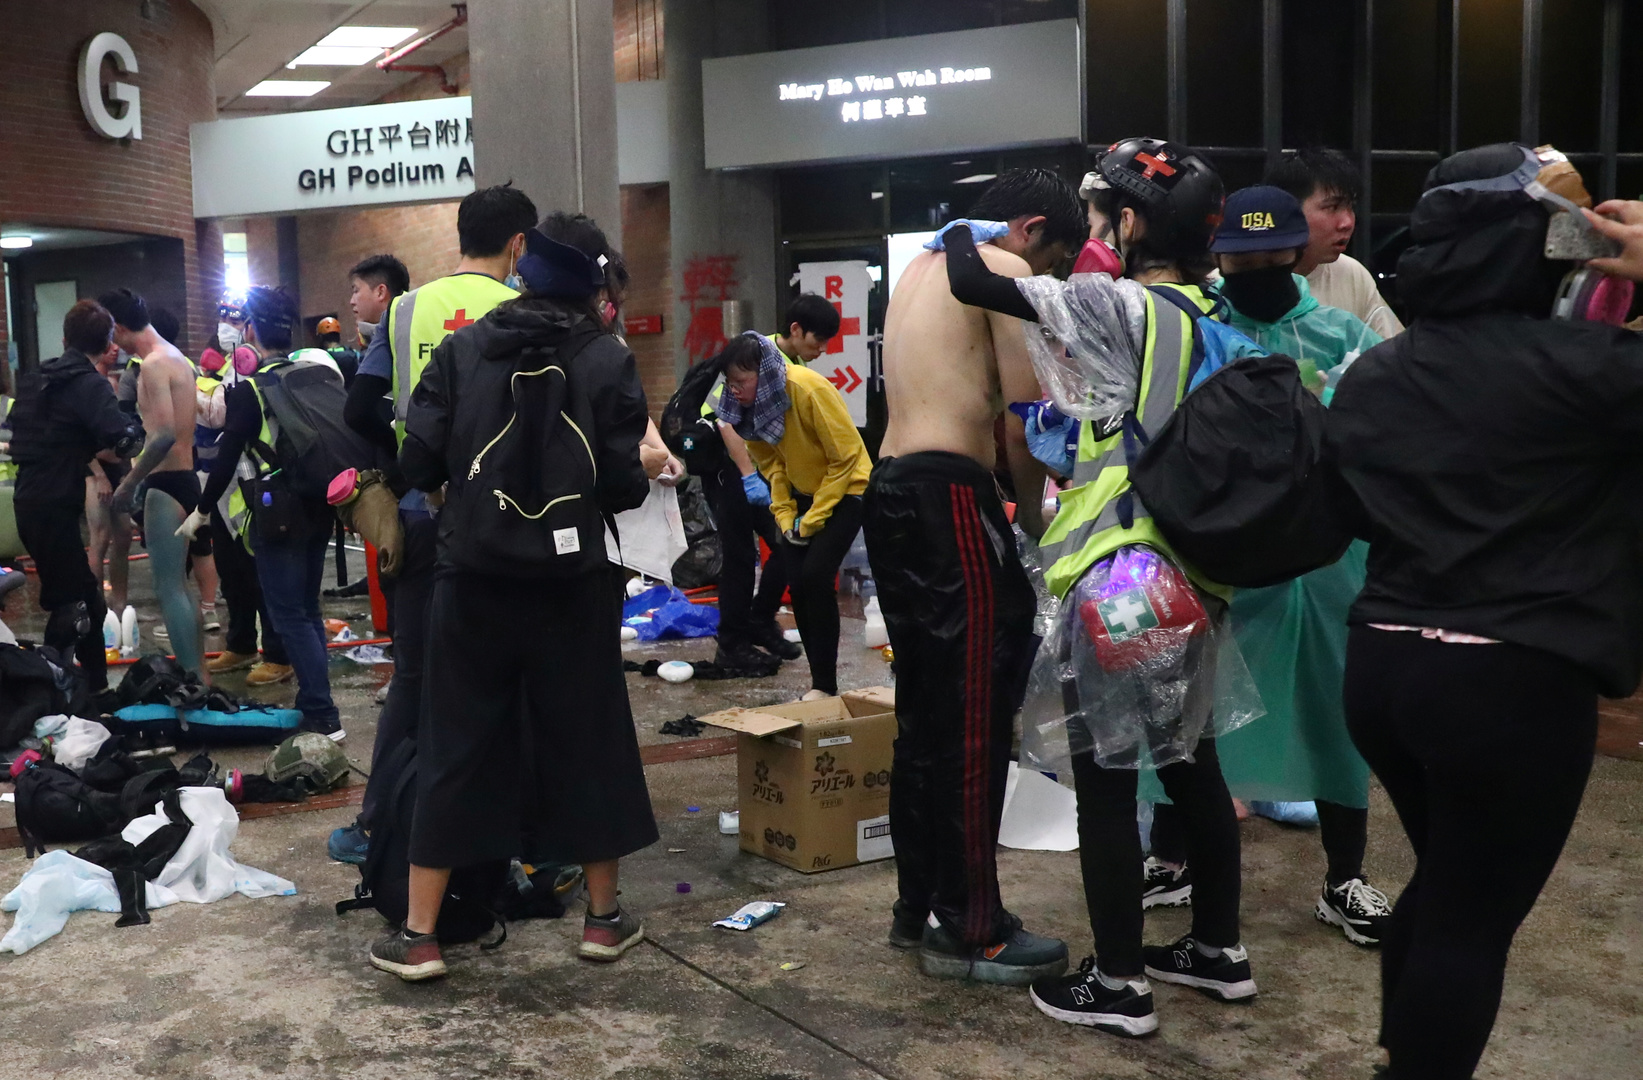 Hongkong-Proteste: Hunderte Demonstranten verbarrikadieren sich in Universität